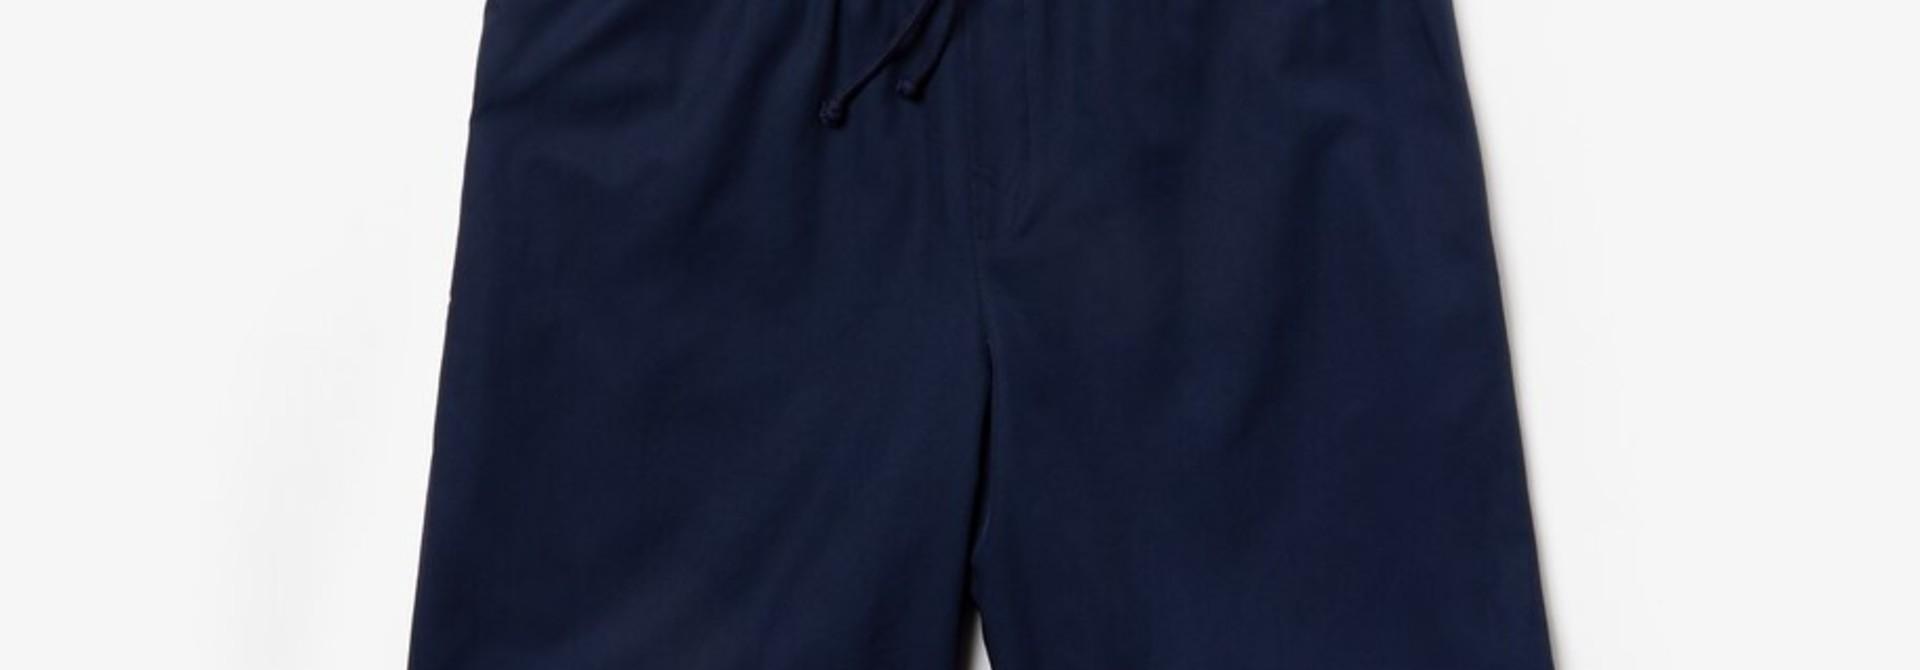 Lacoste Short Navy Blue